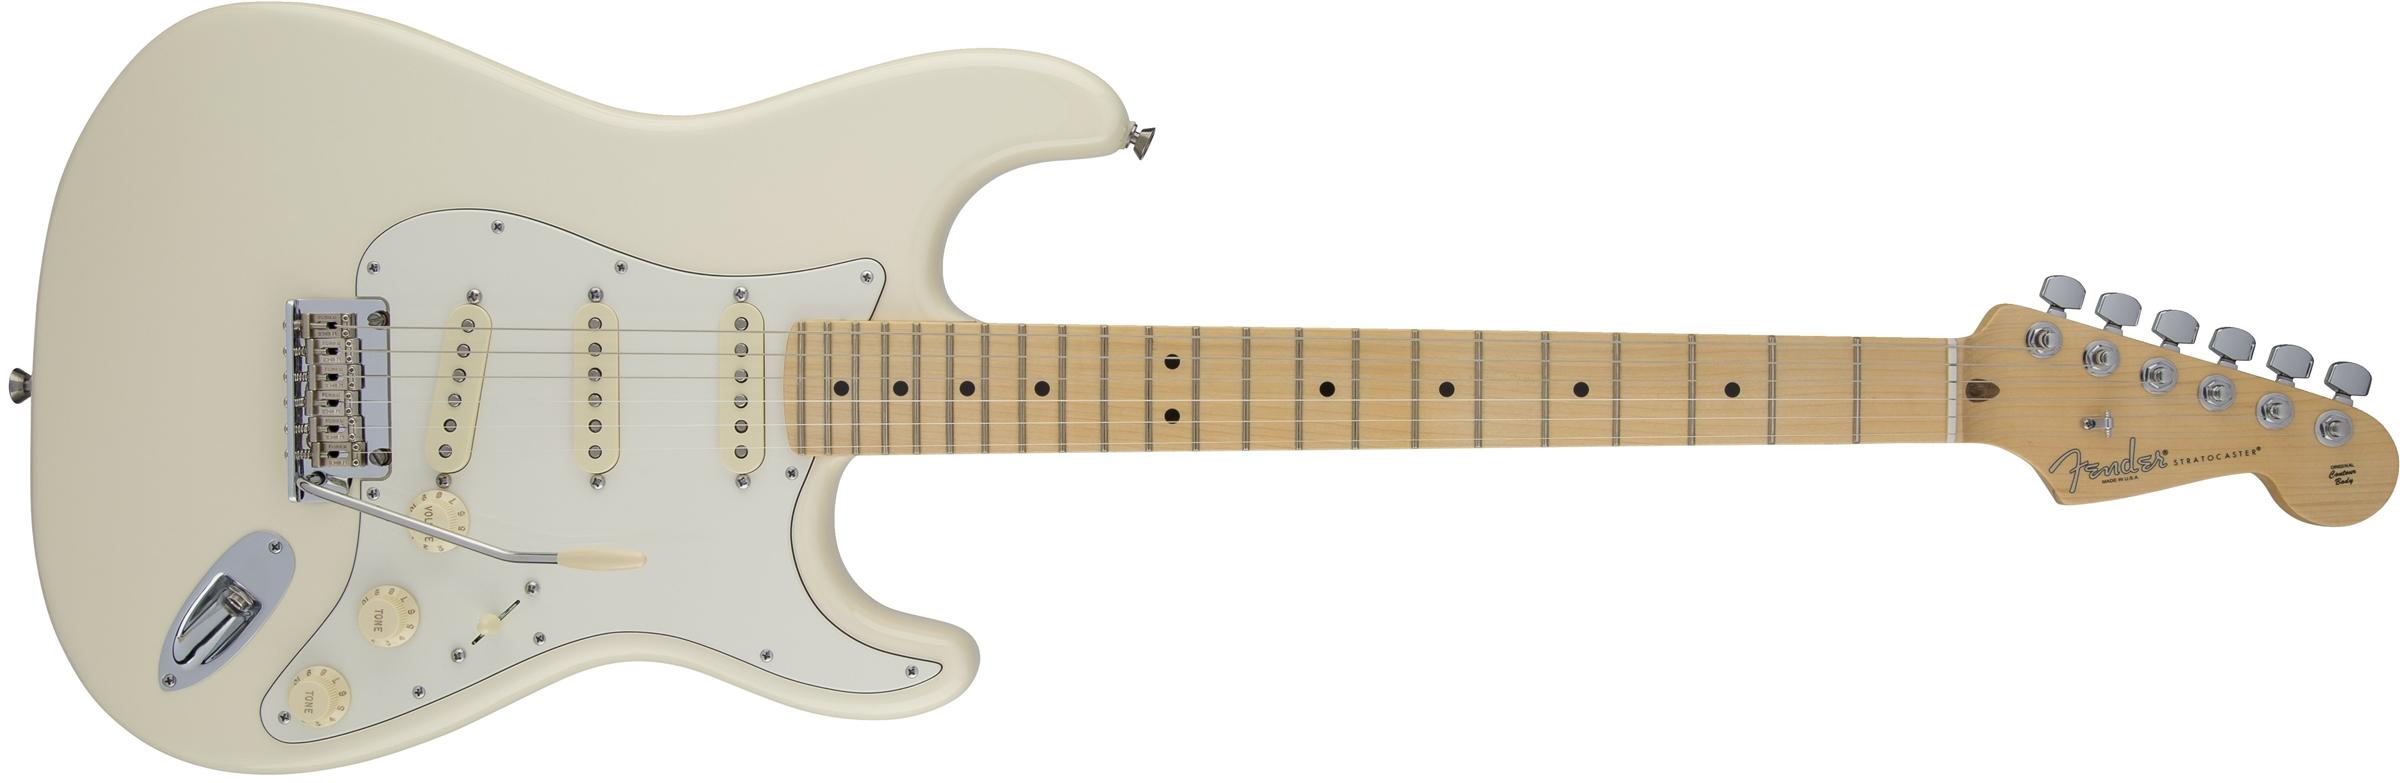 american standard stratocaster maple fingerboard olympic white fender electric guitars. Black Bedroom Furniture Sets. Home Design Ideas